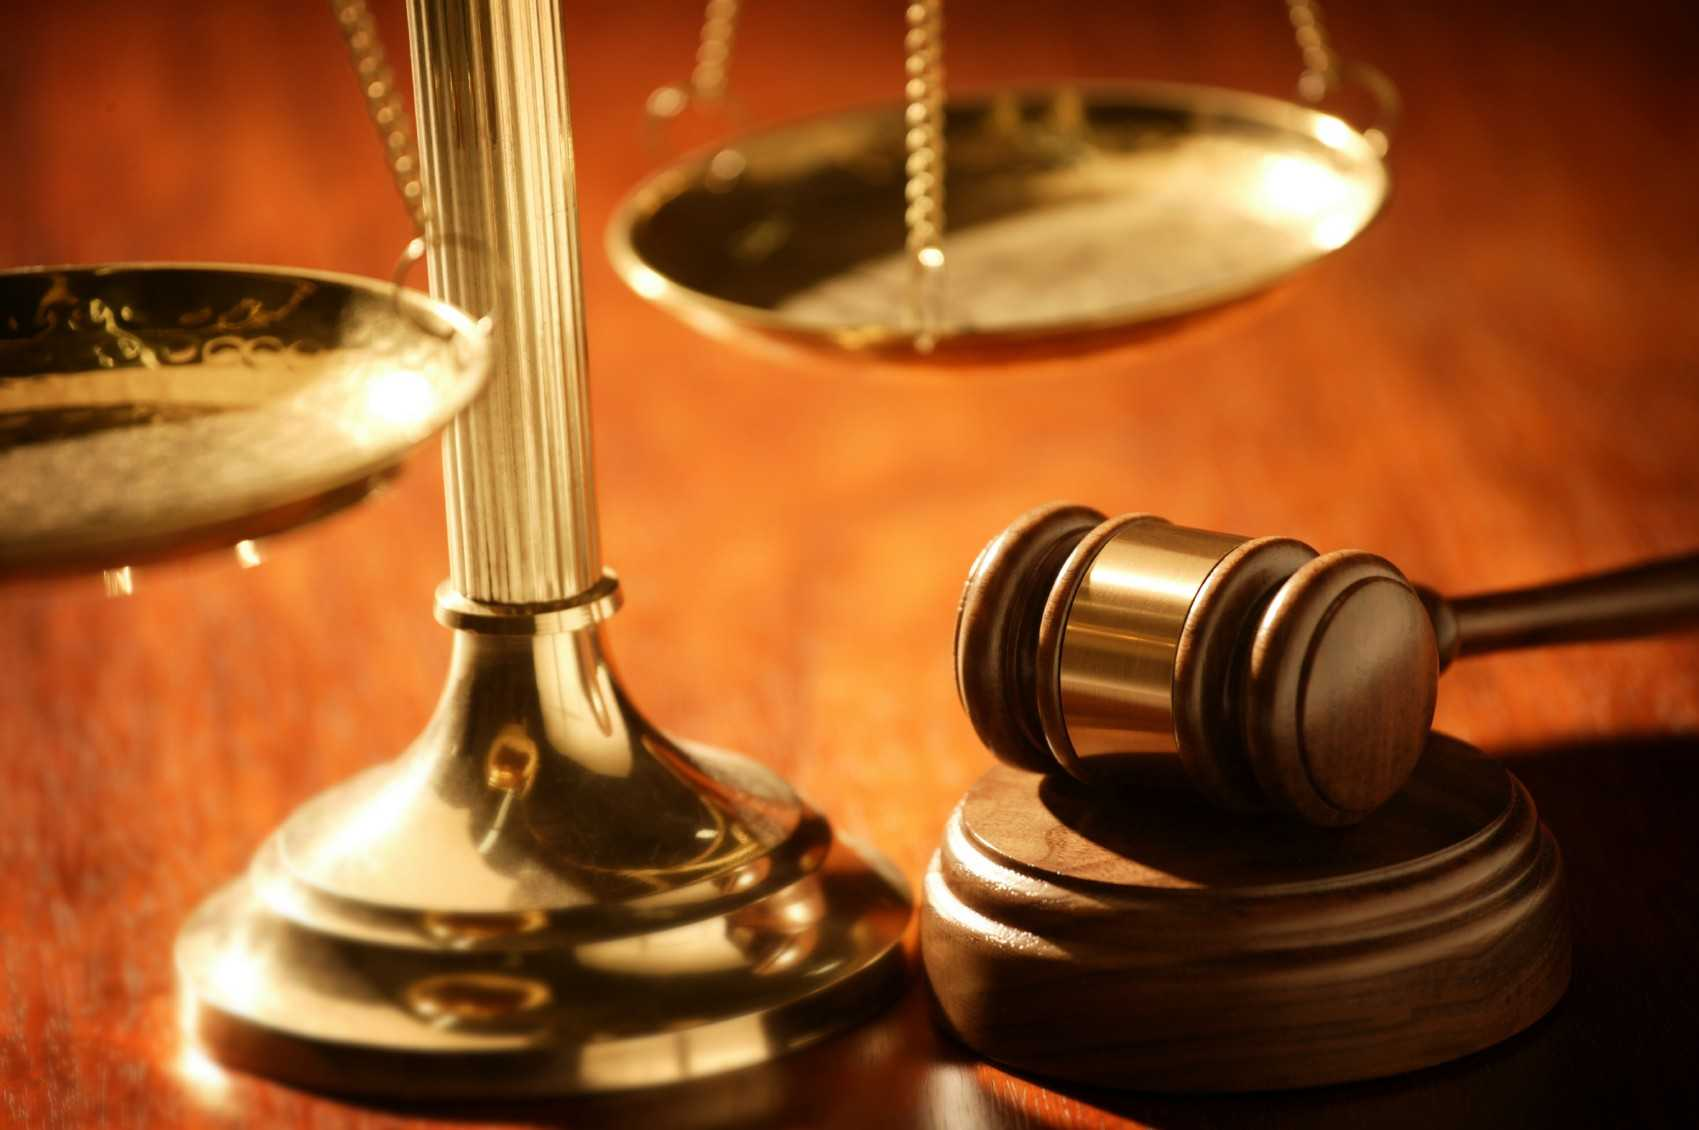 судейский молоток и весы на столе